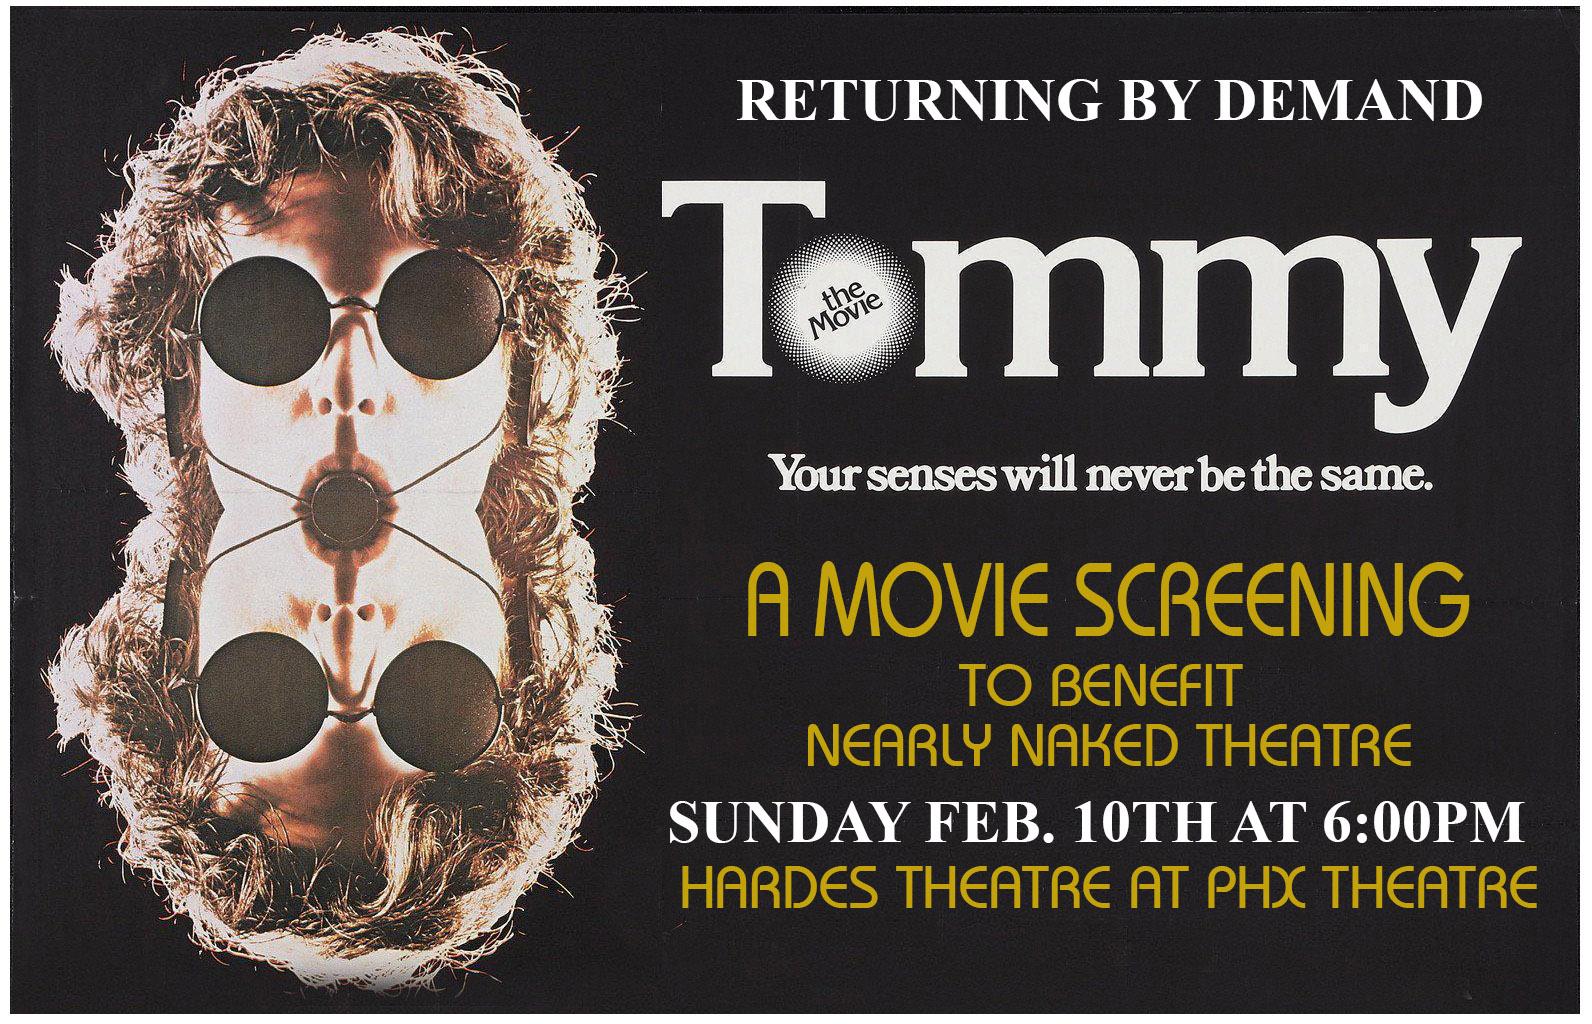 Tommy NNT Movie Screening